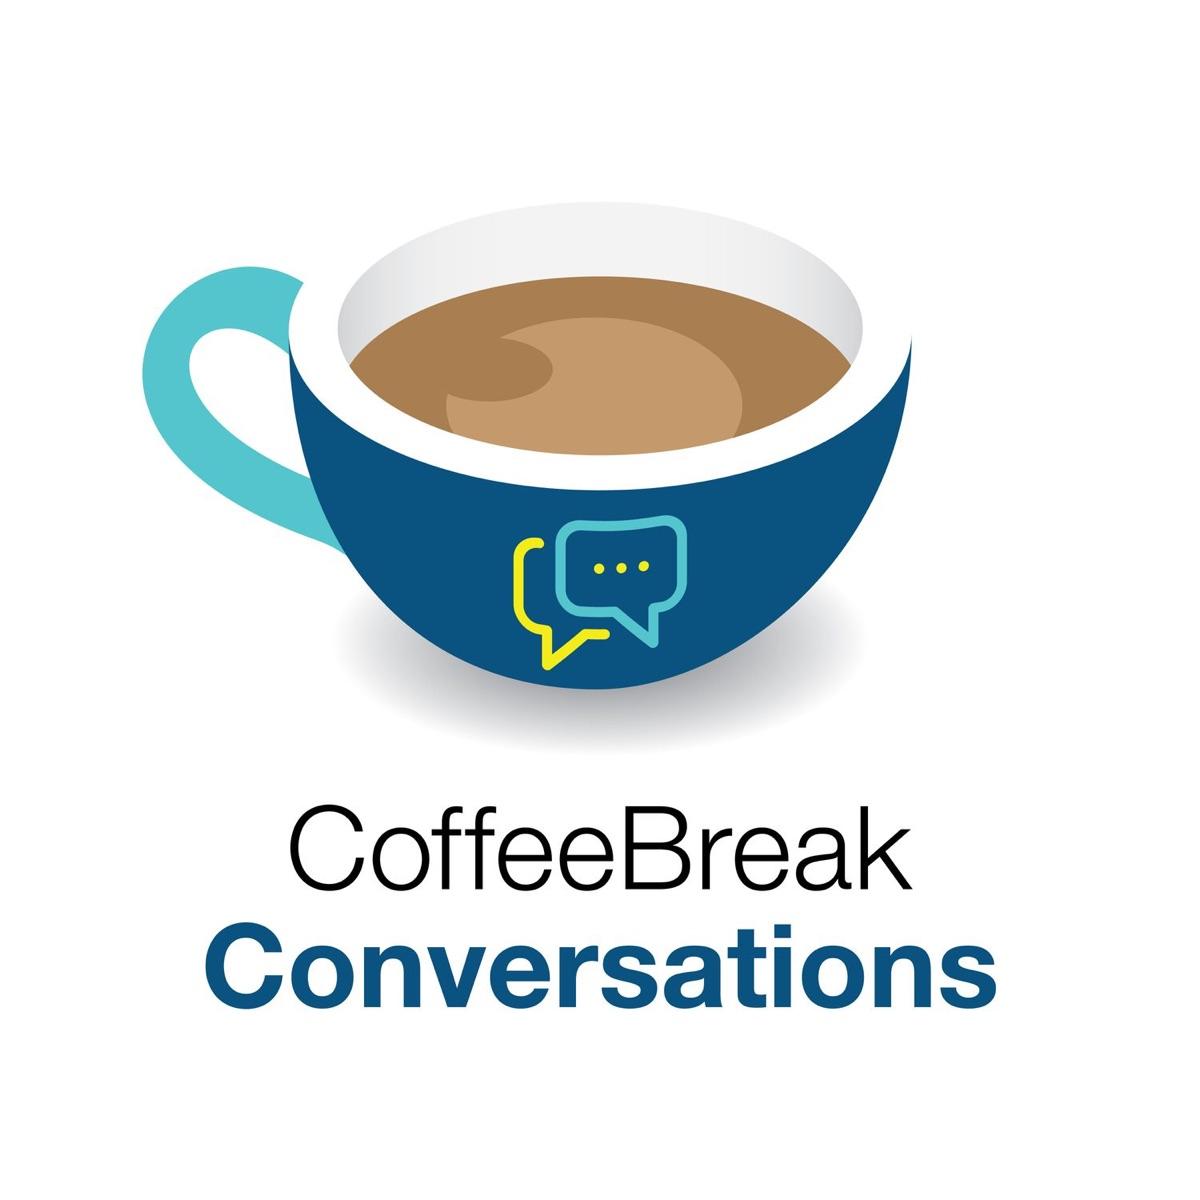 Coffee Break Conversations